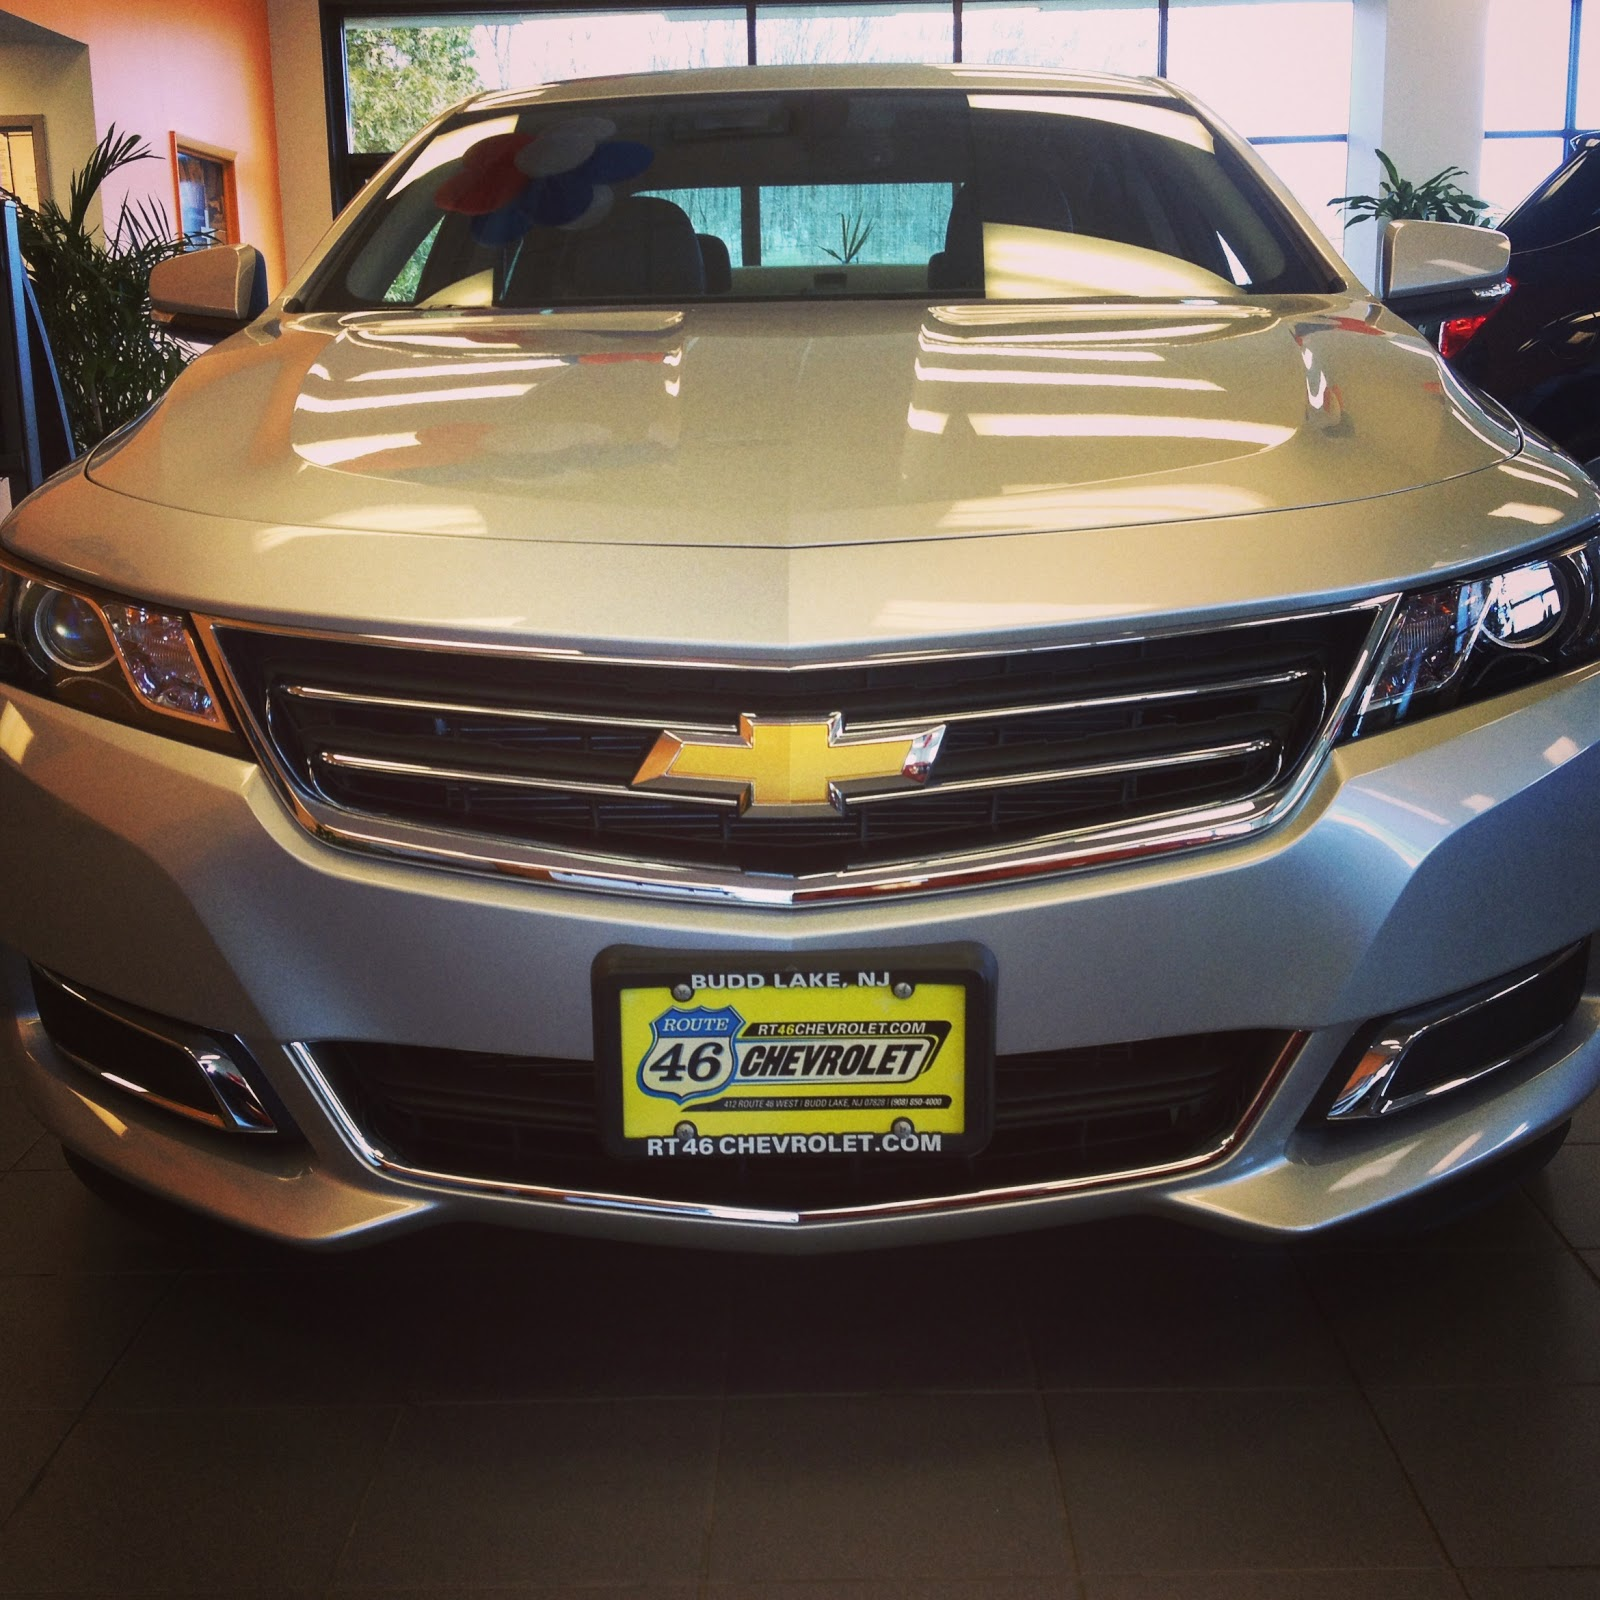 Route 46 Chevrolet 2014 Chevy Impala